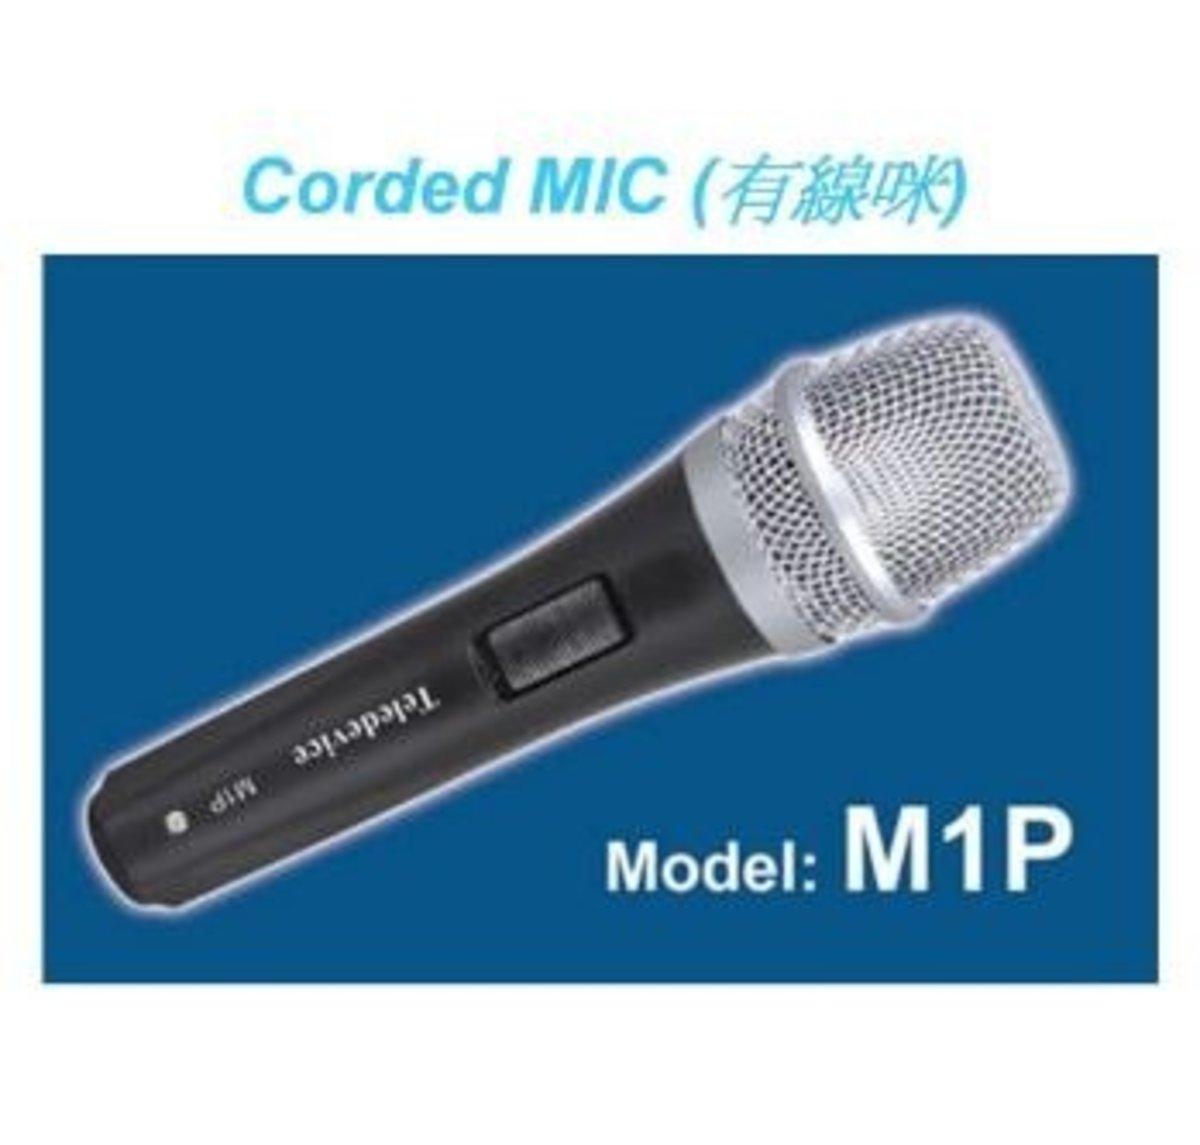 M1P 超輕身有線咪【香港行貨】